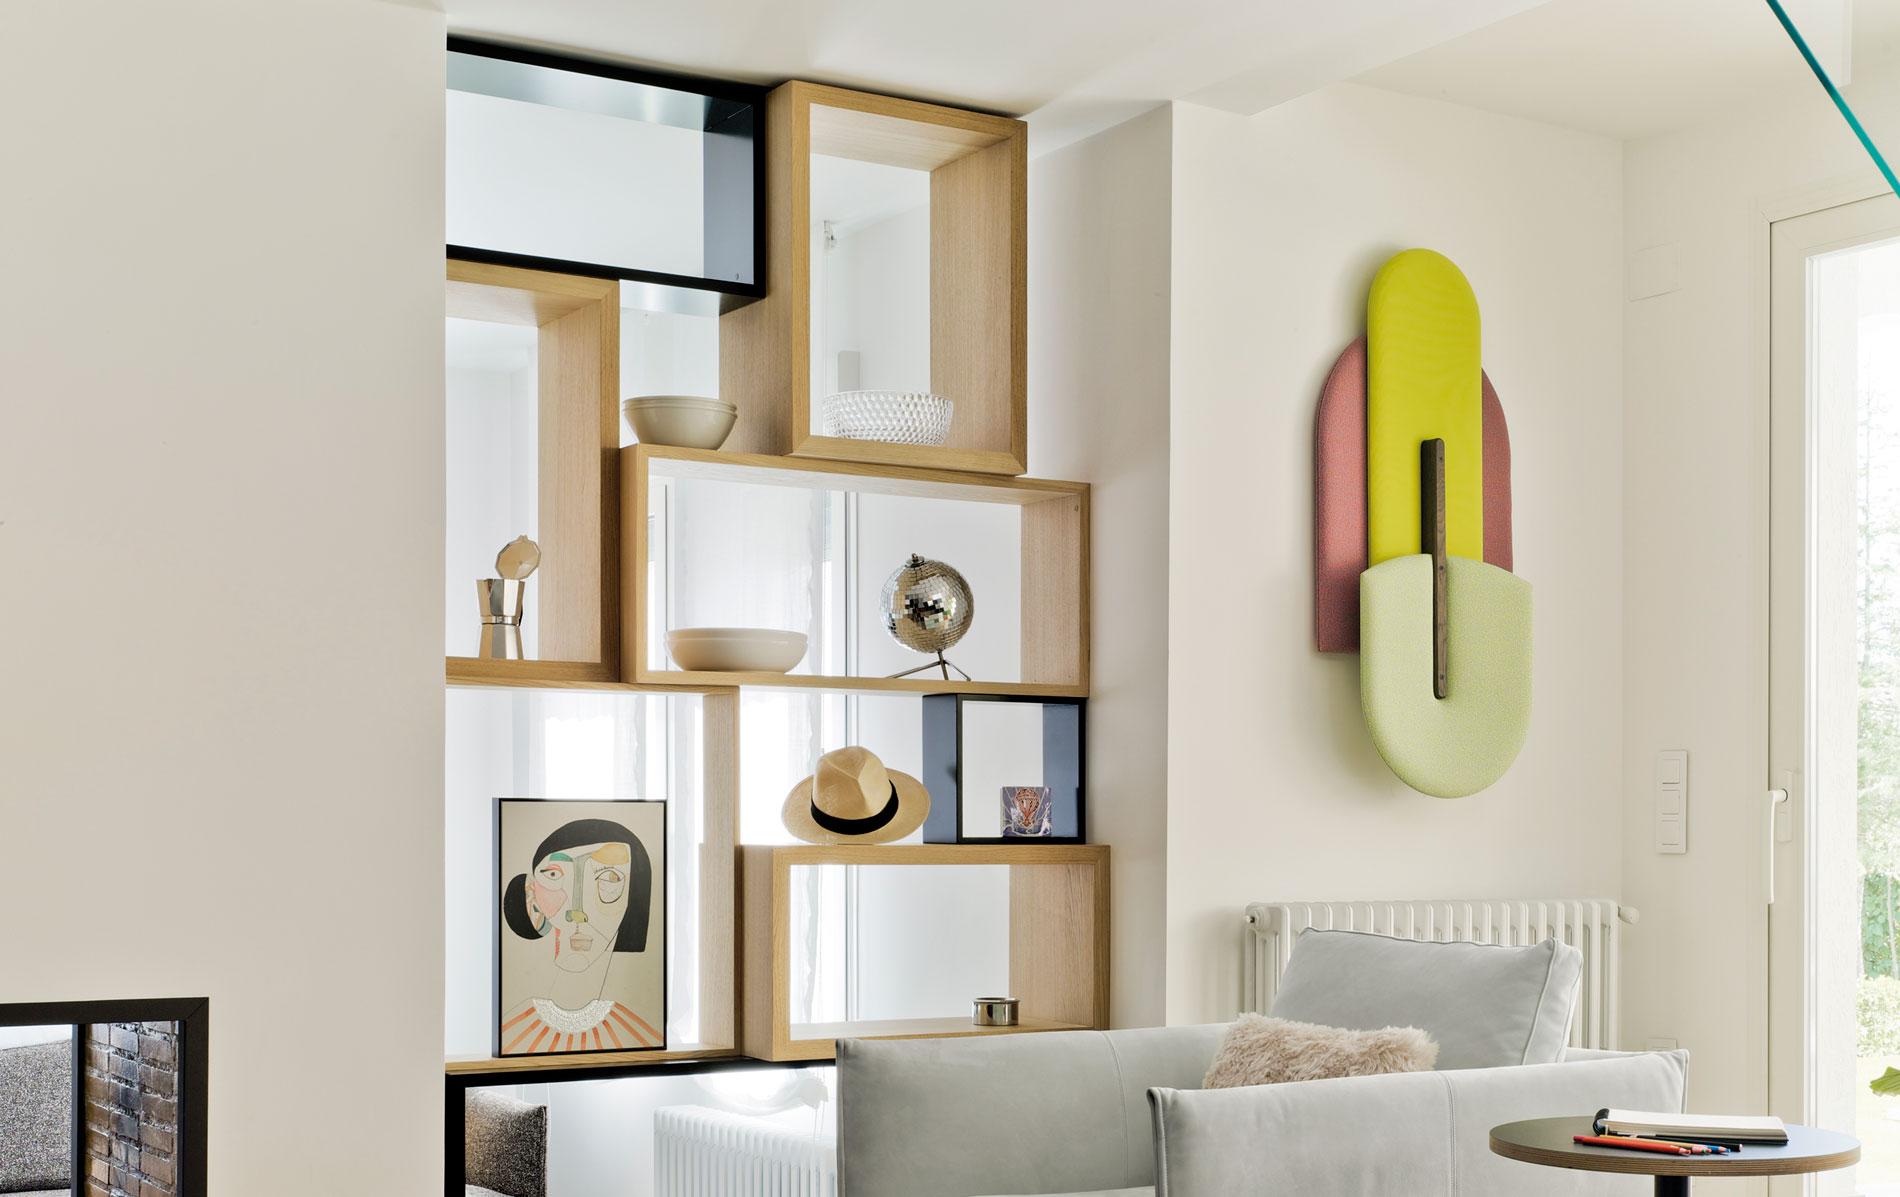 Panel personalizable fonoabsorbente Beetle. Imagen y diseño de SANCAL